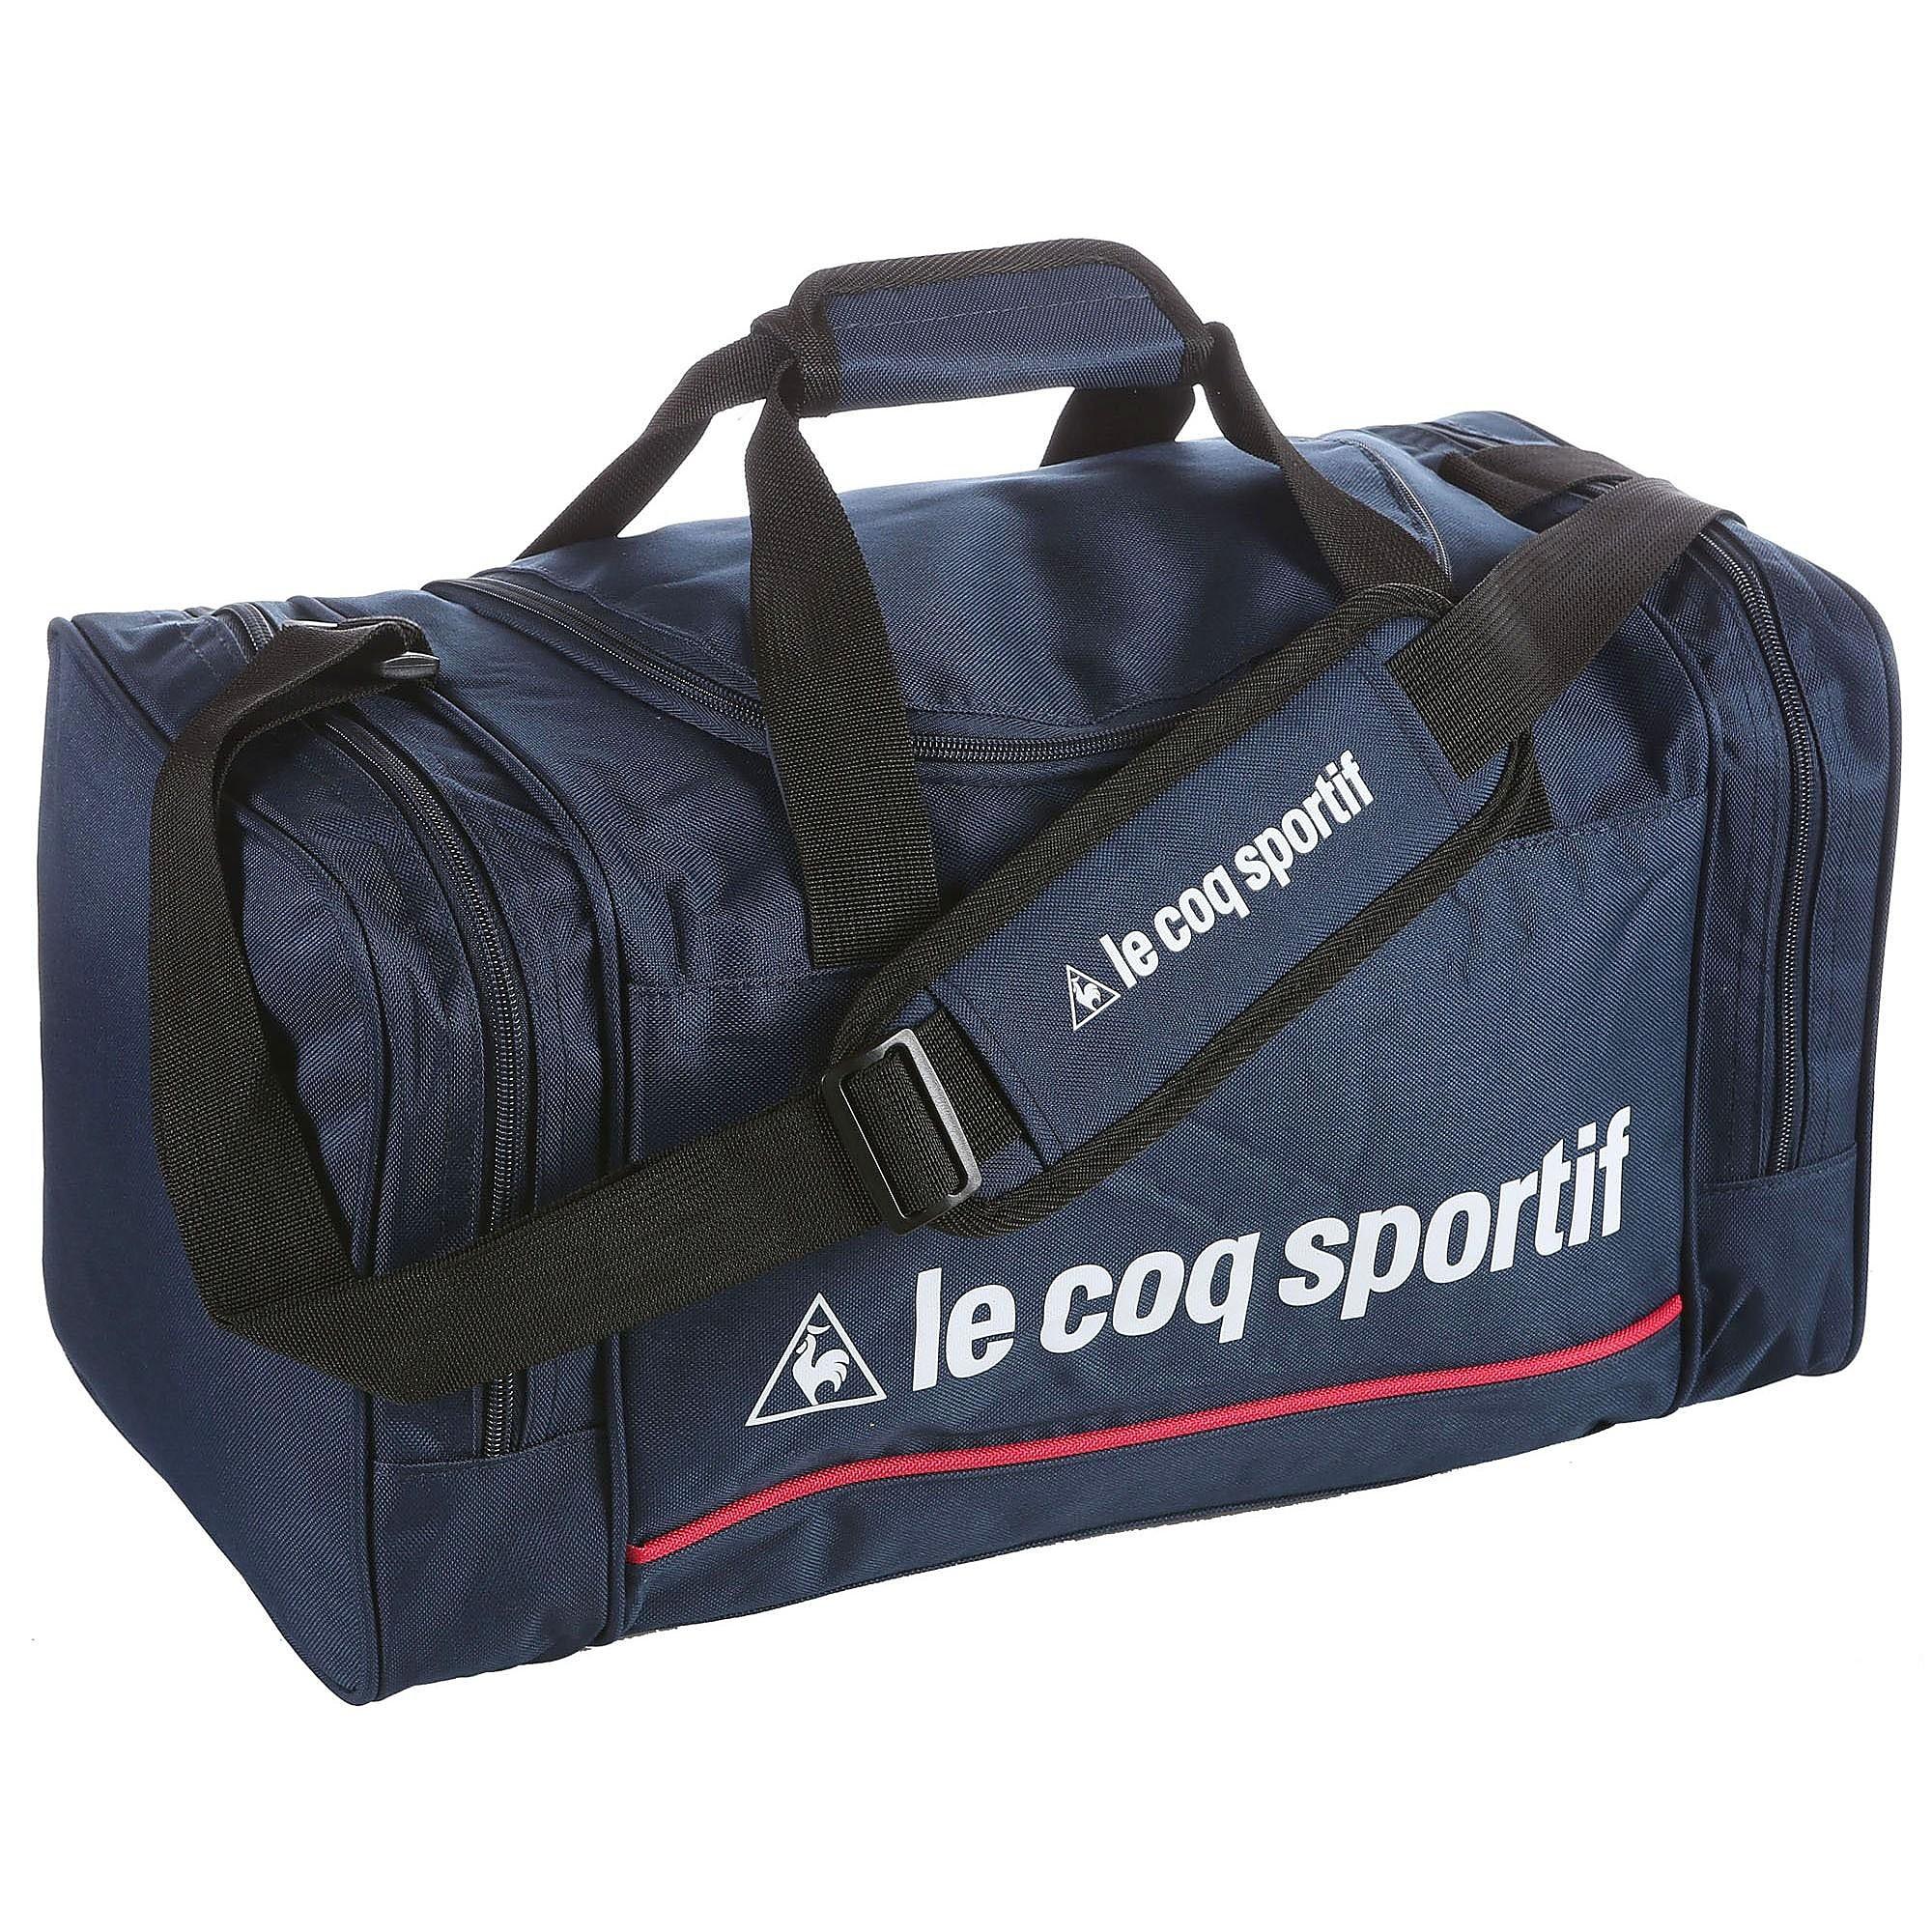 Le coq sportif DORIEN SPORTTAS